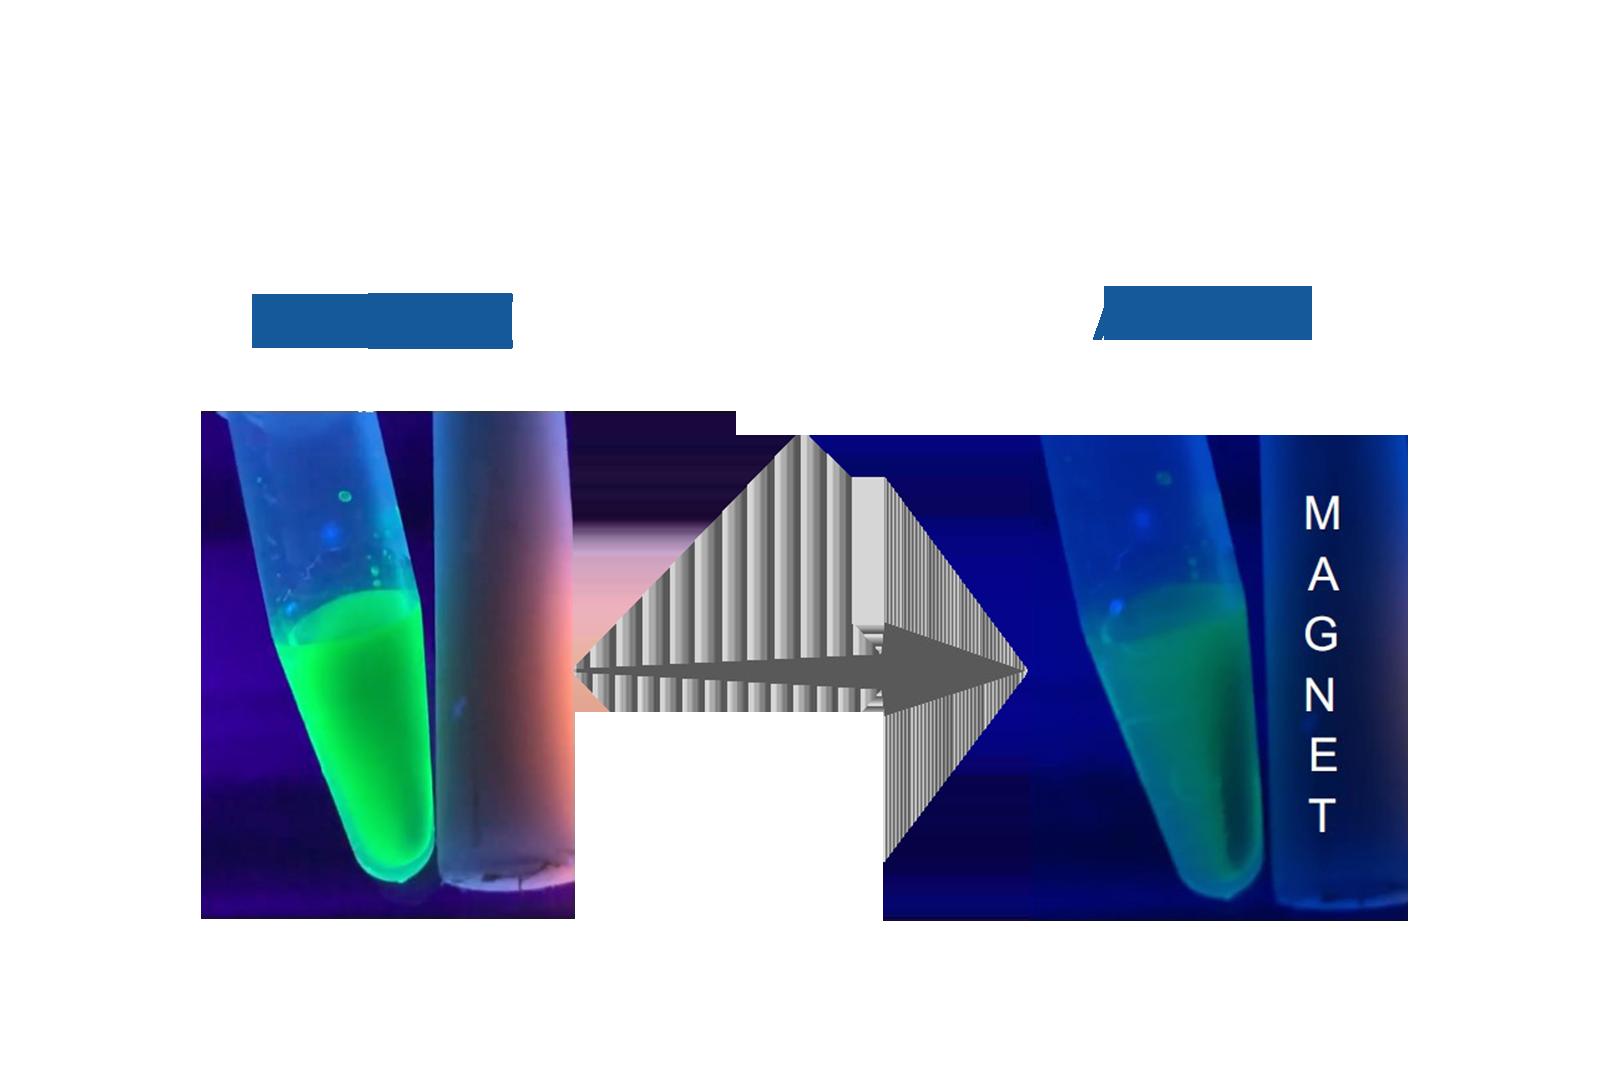 Bright Green CdSe Based Quantum Dots (Magnetic)